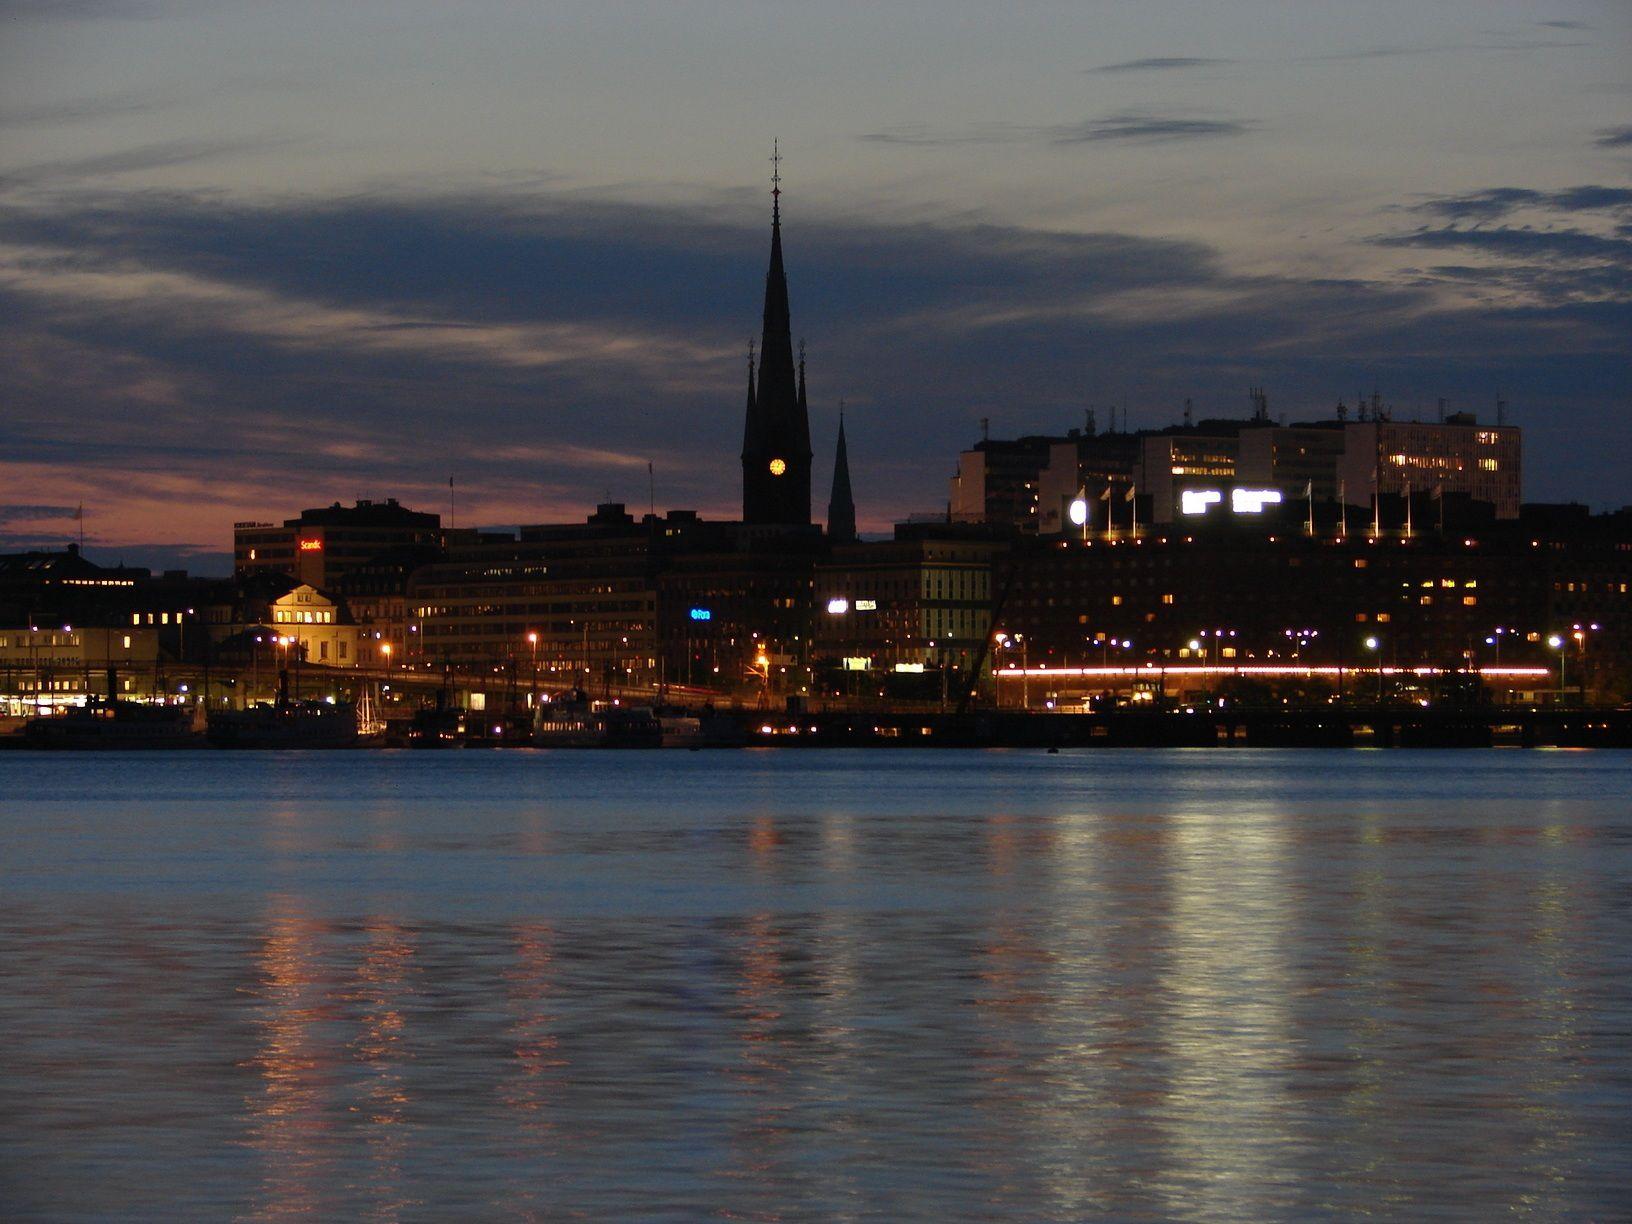 stockholm inS unset sweeden in European Union